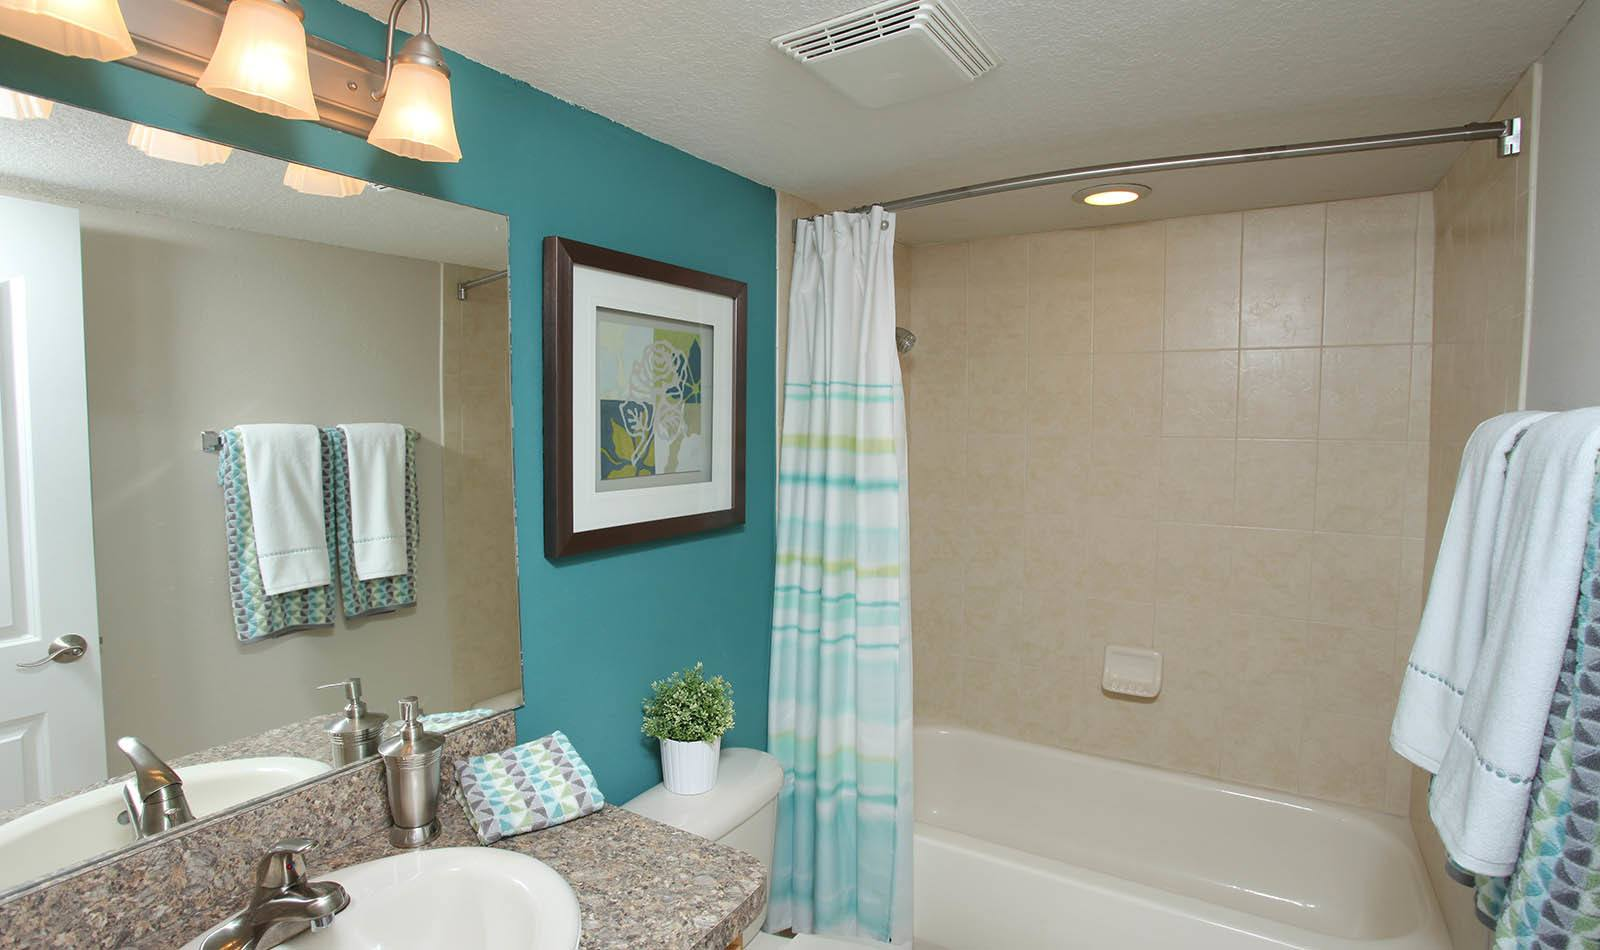 Bathroom at Waters Pointe Apartments in South Pasadena, FL